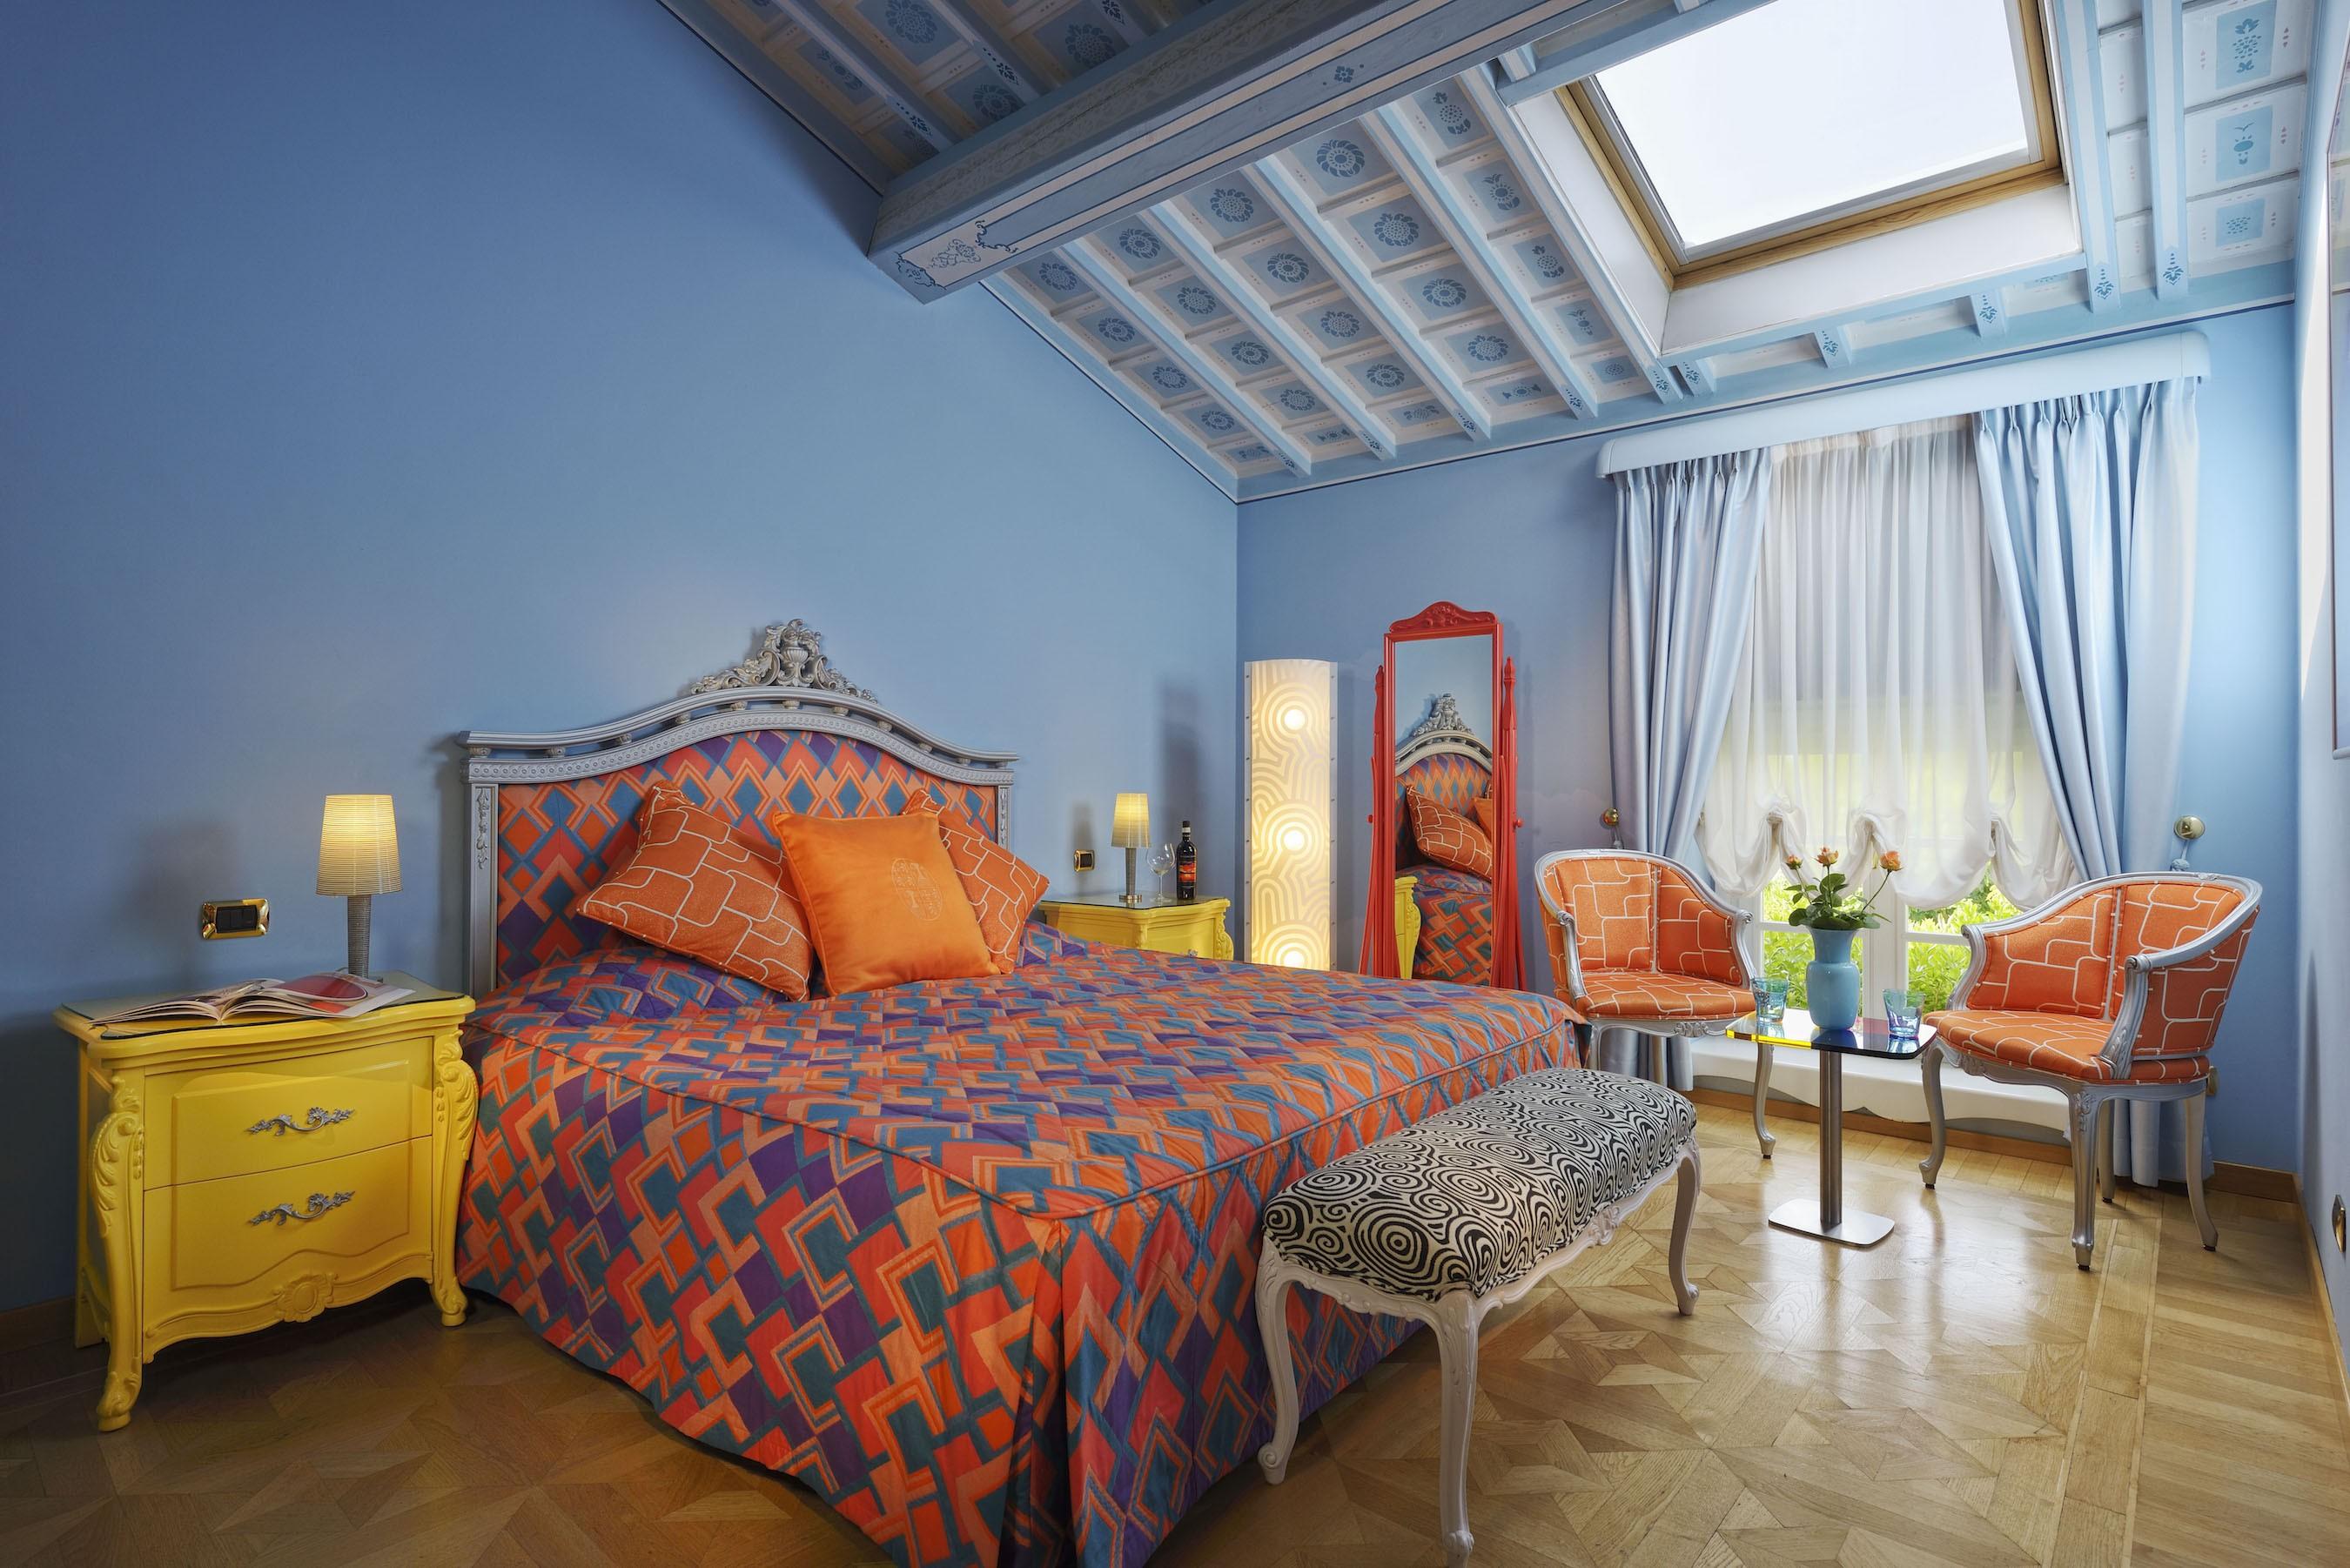 Byblos Art Hotel Villa Amista, San Pietro In Cariano, Veneto, Italy